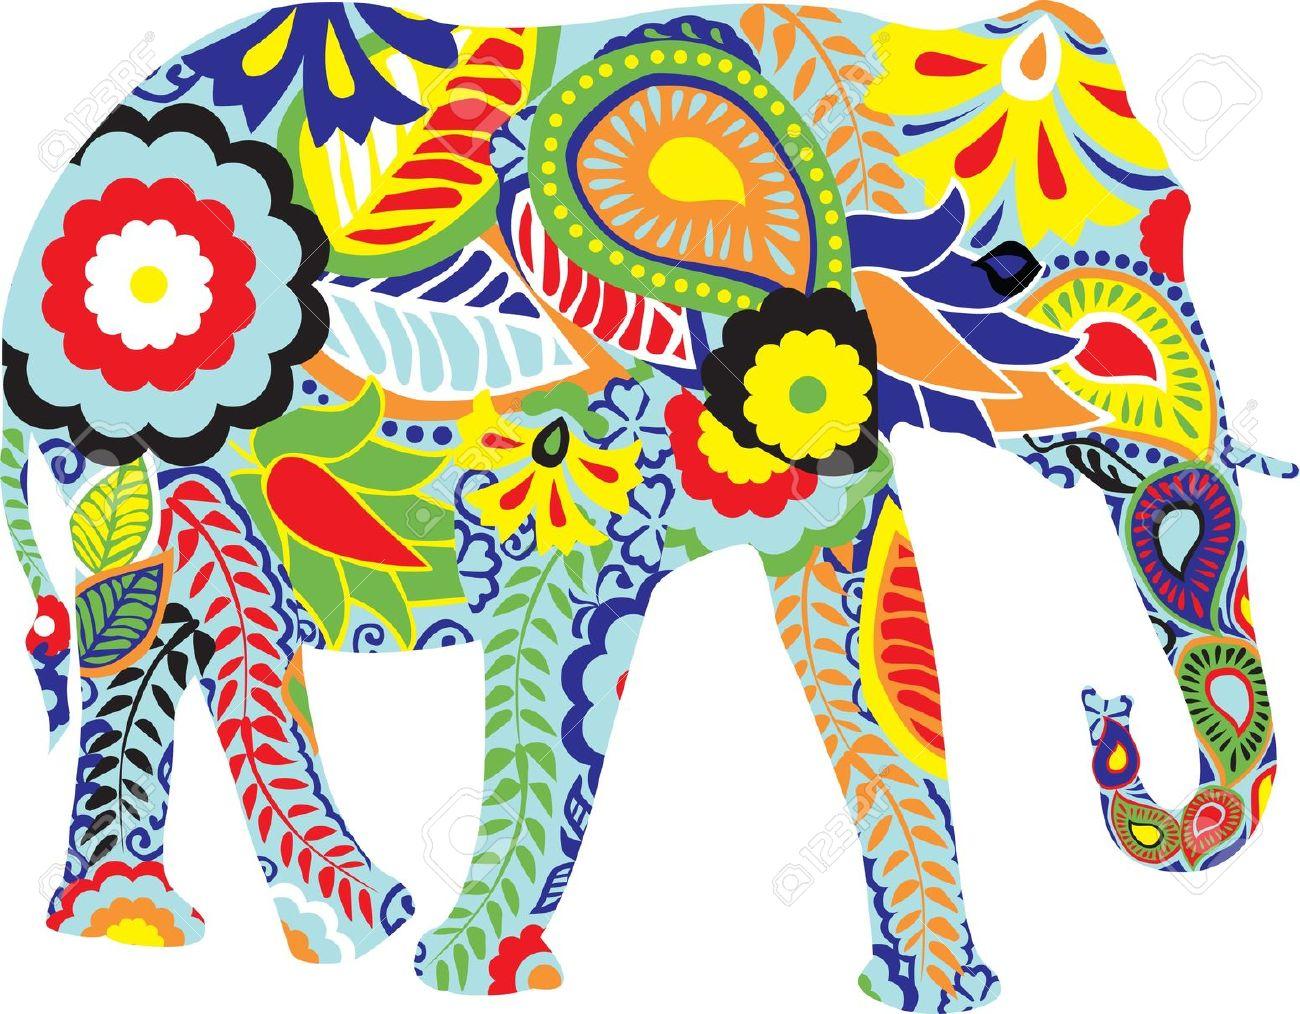 Free india design cliparts. Clipart elephant designer